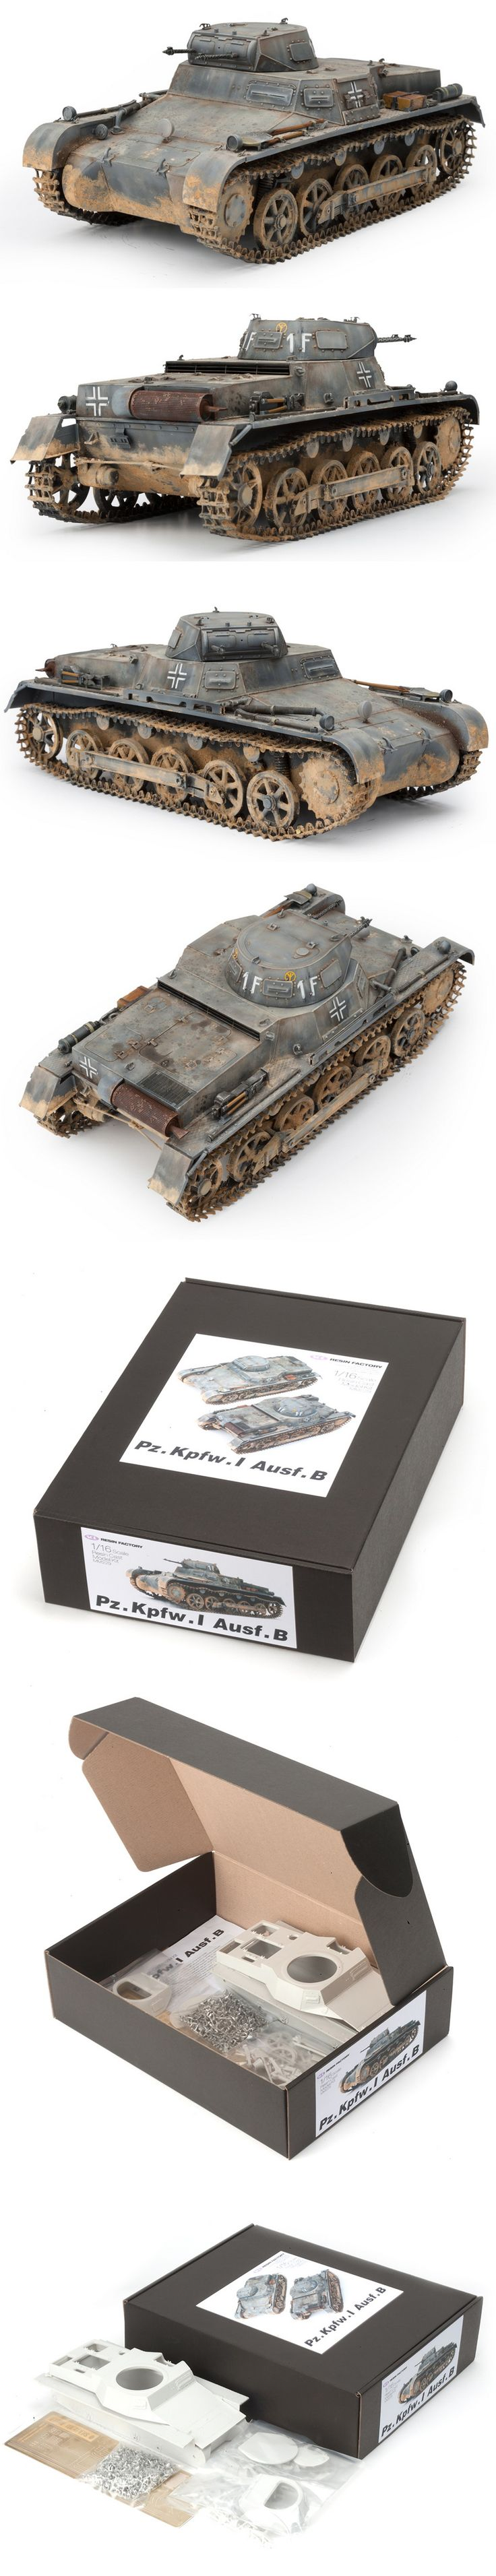 1/16 resincast model kit Pz.Kpfw. 1 Ausf.B